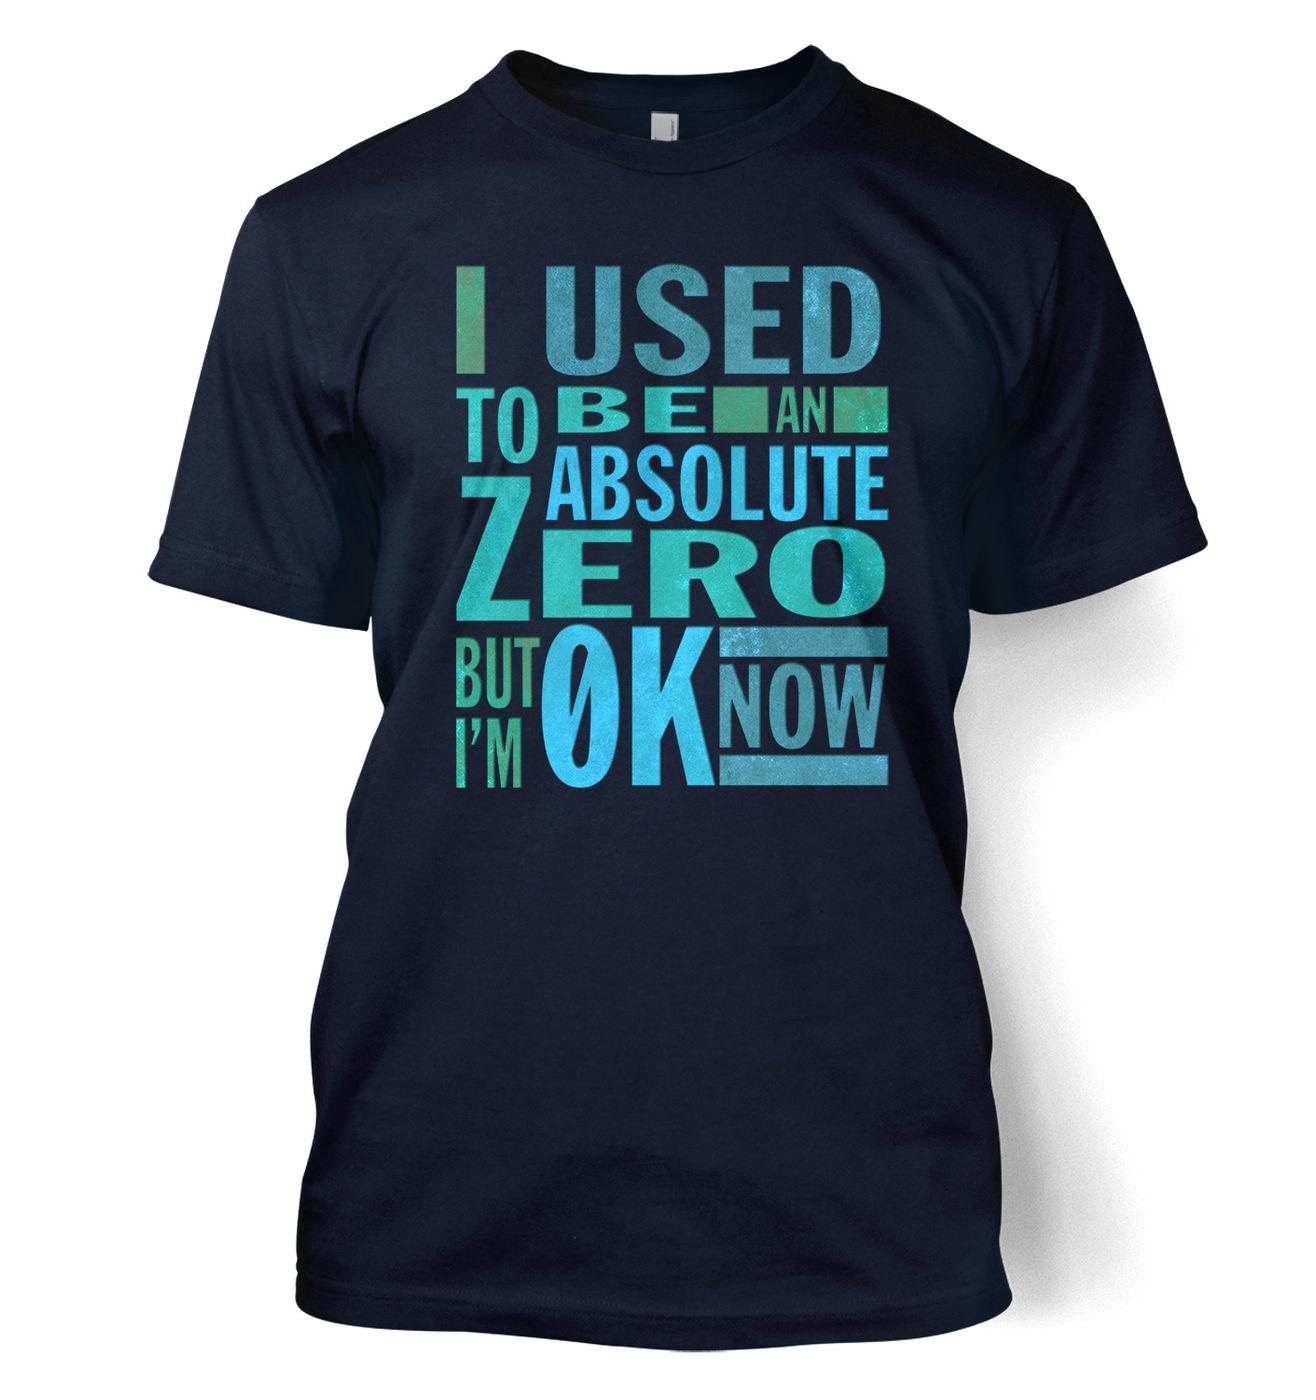 Absolute Zero 0K Now t-shirt - funny science slogan tshirt